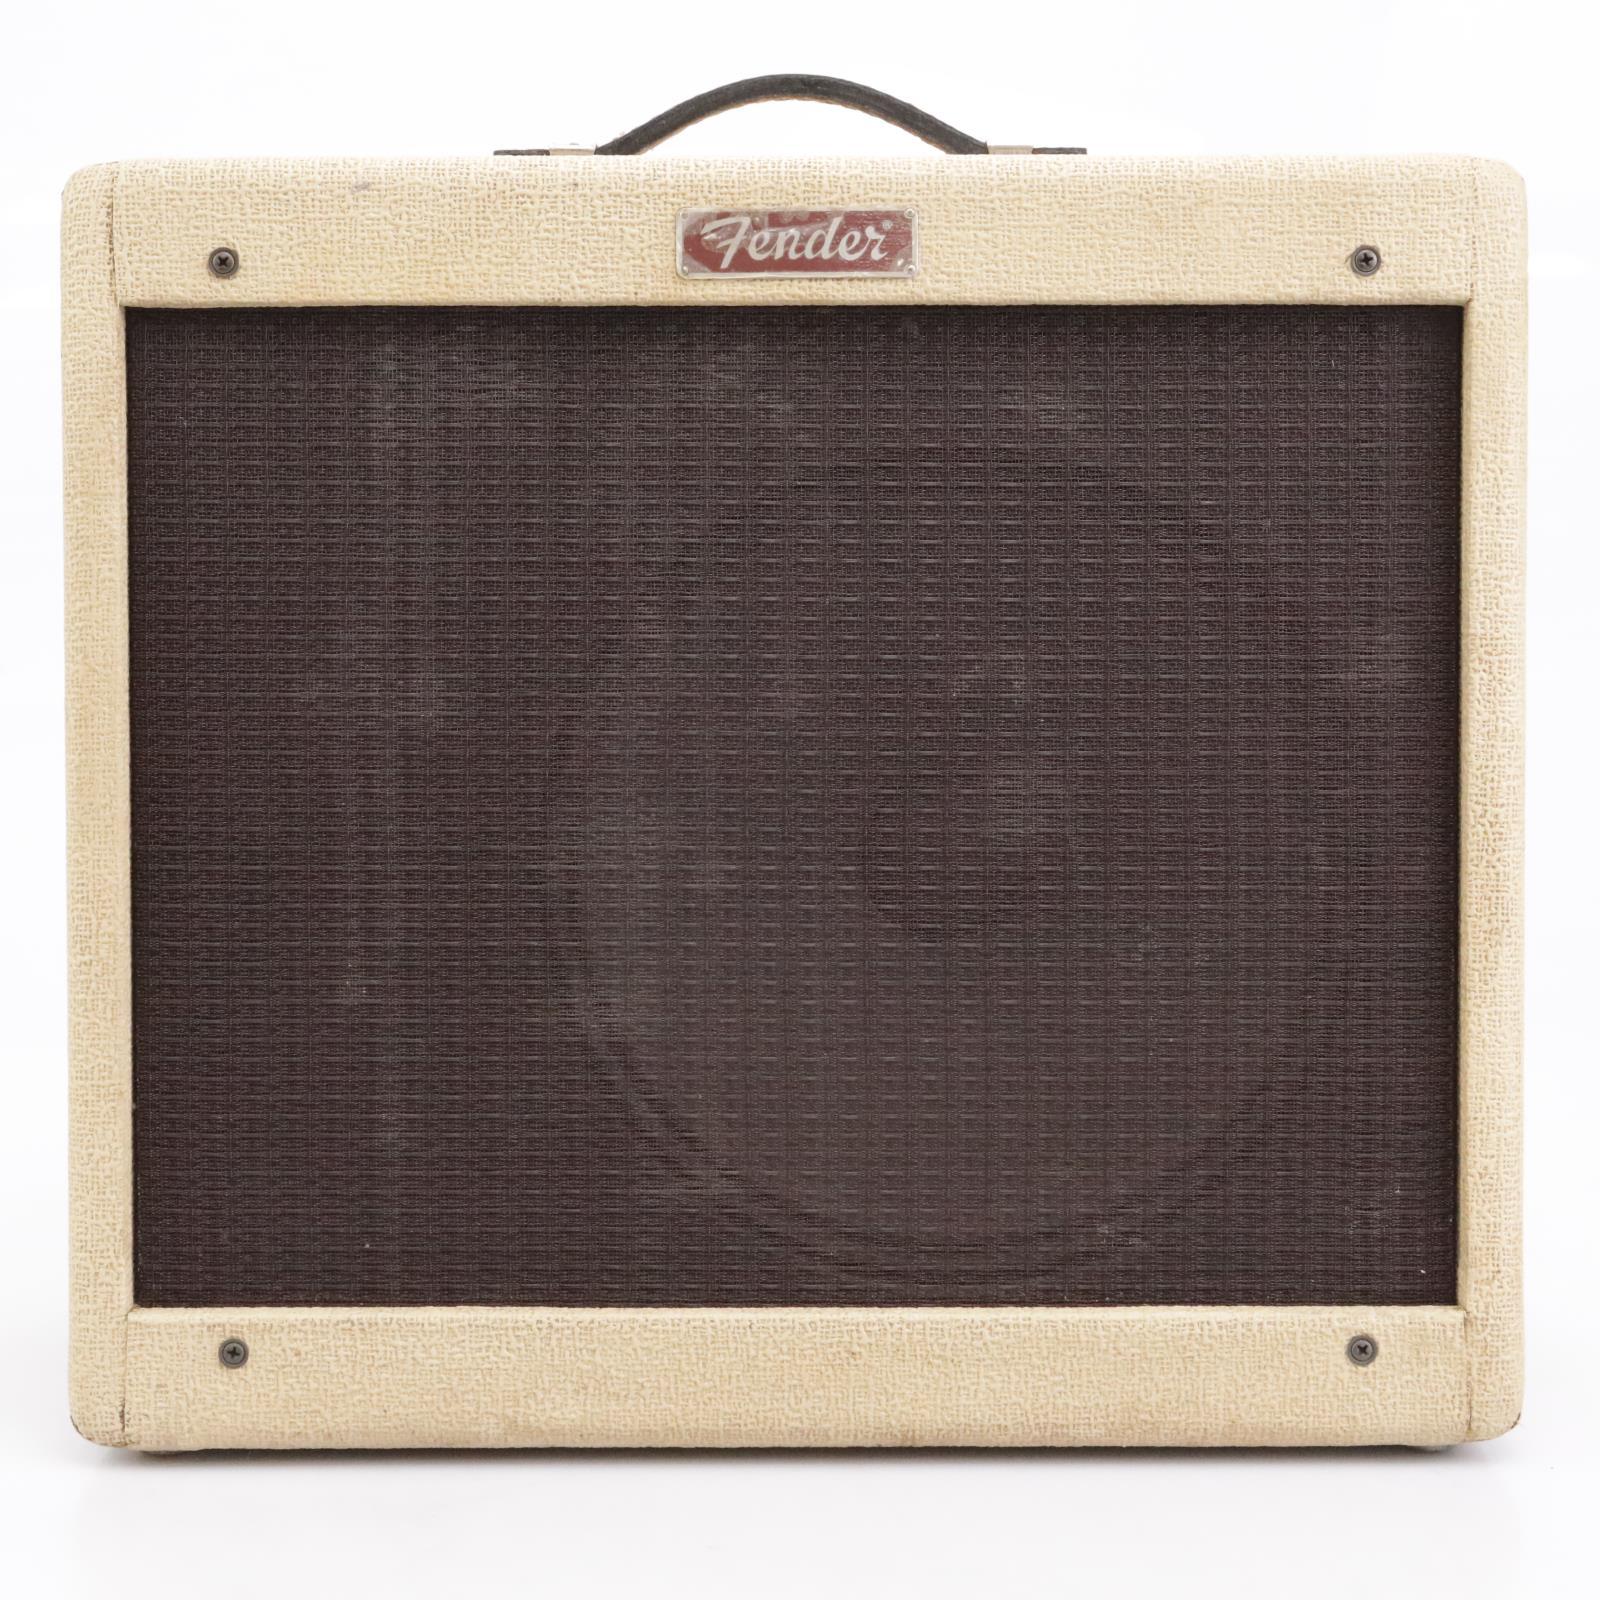 Fender Blues Junior 15-Watt Tube Guitar Combo Amp Amplifier #43412